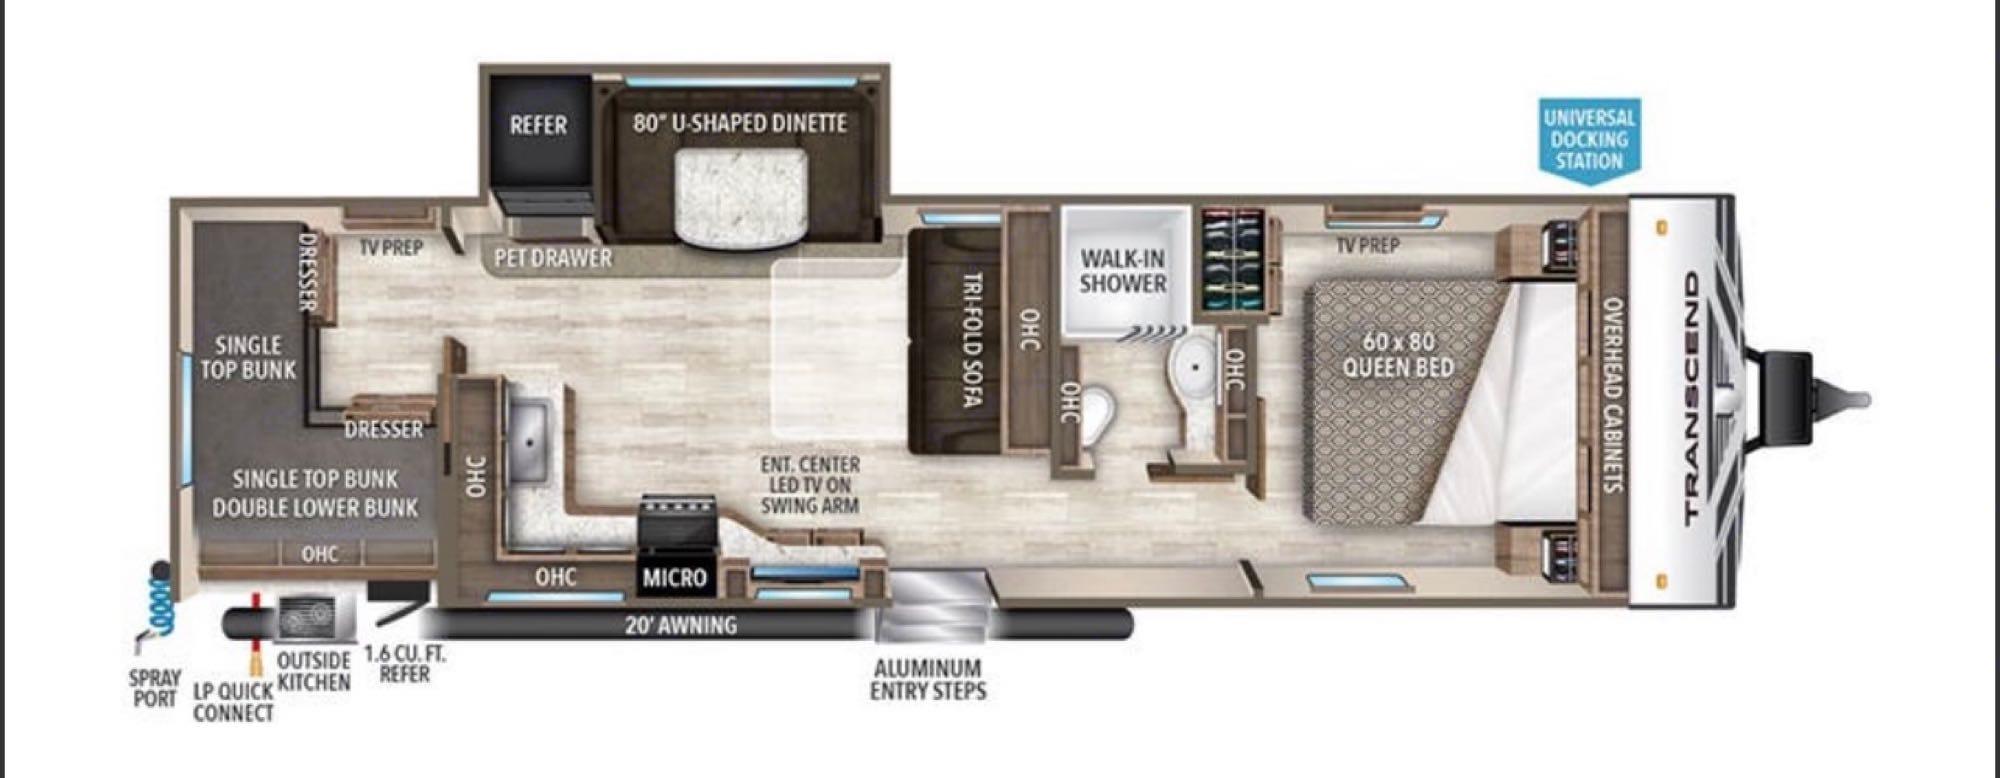 Grand Design GMC 2020